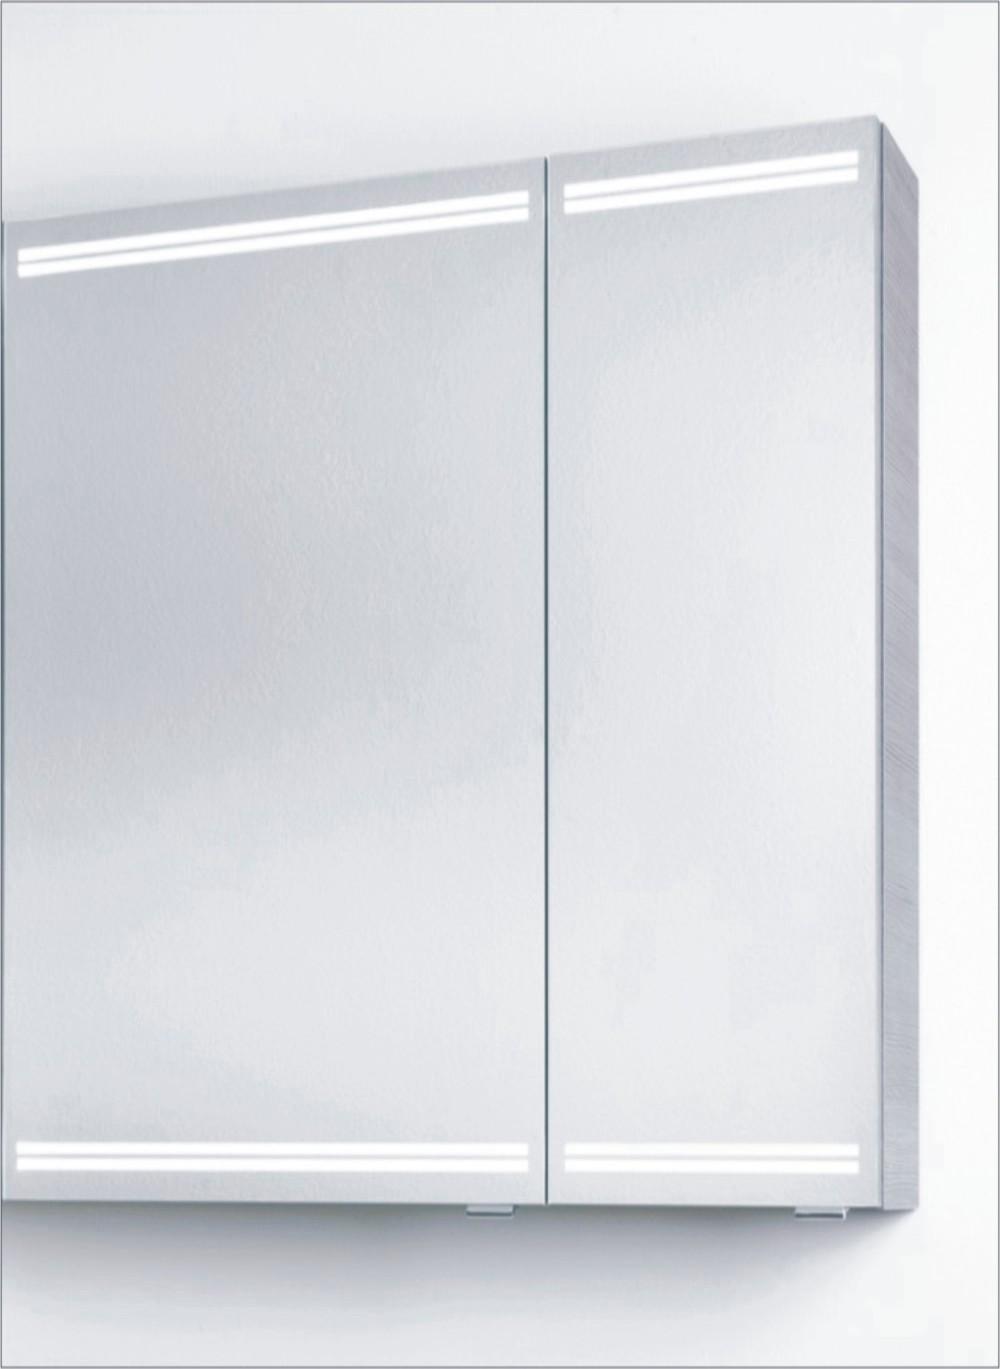 pelipal pcon spiegelschrank led beleuchtung 70 cm arcom center. Black Bedroom Furniture Sets. Home Design Ideas